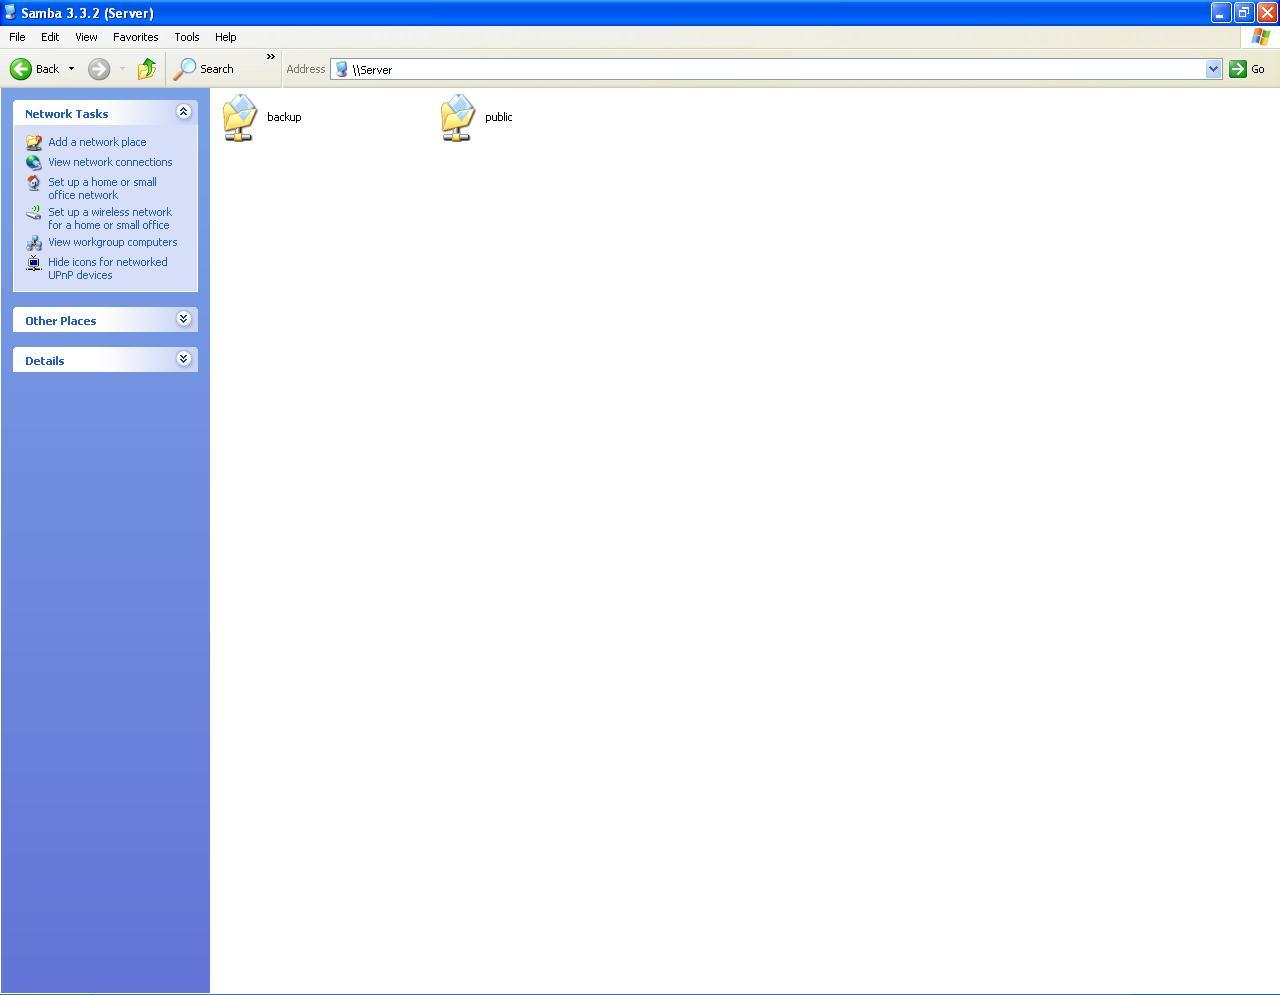 How to setup Samba (file server)